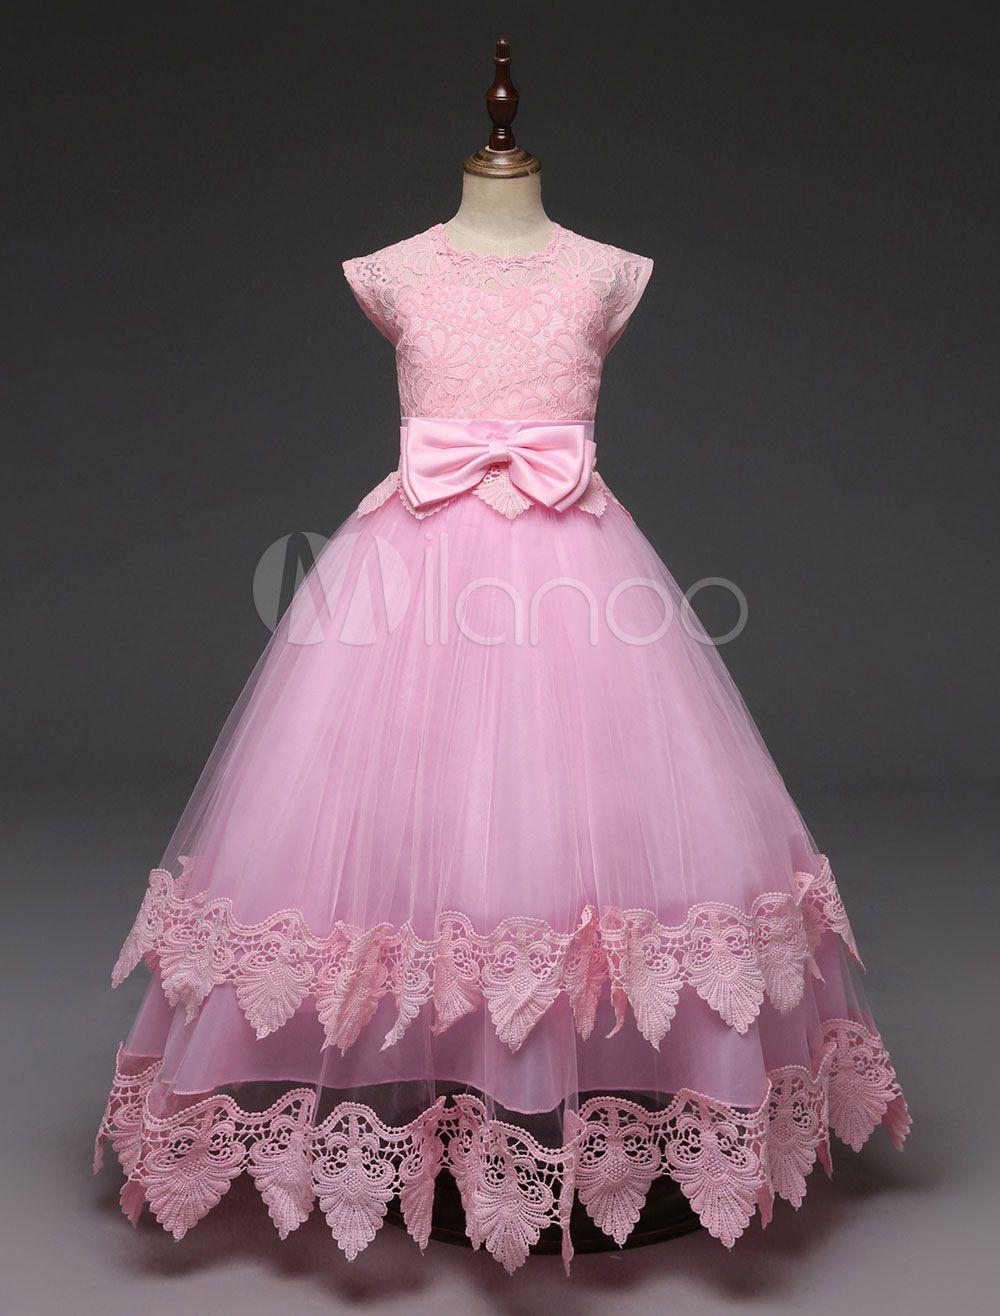 Pink flower girl dresses short sleeve lace bow a line floor length